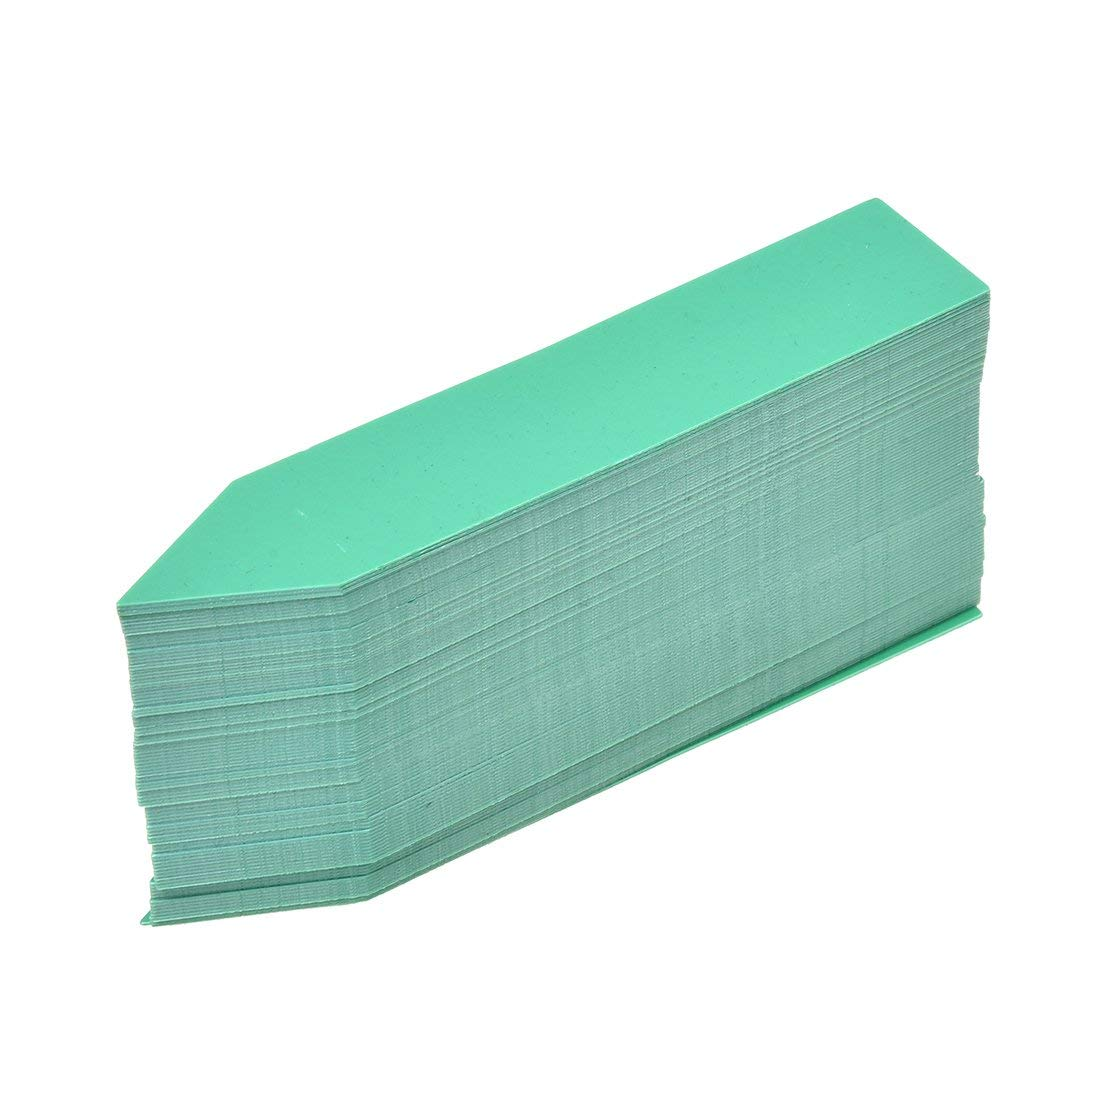 TOOGOO(R) 100 Pcs Plastic Plant Seed Labels Pot Marker Nursery Garden Stake Tags 10cm x 2cm (Green)